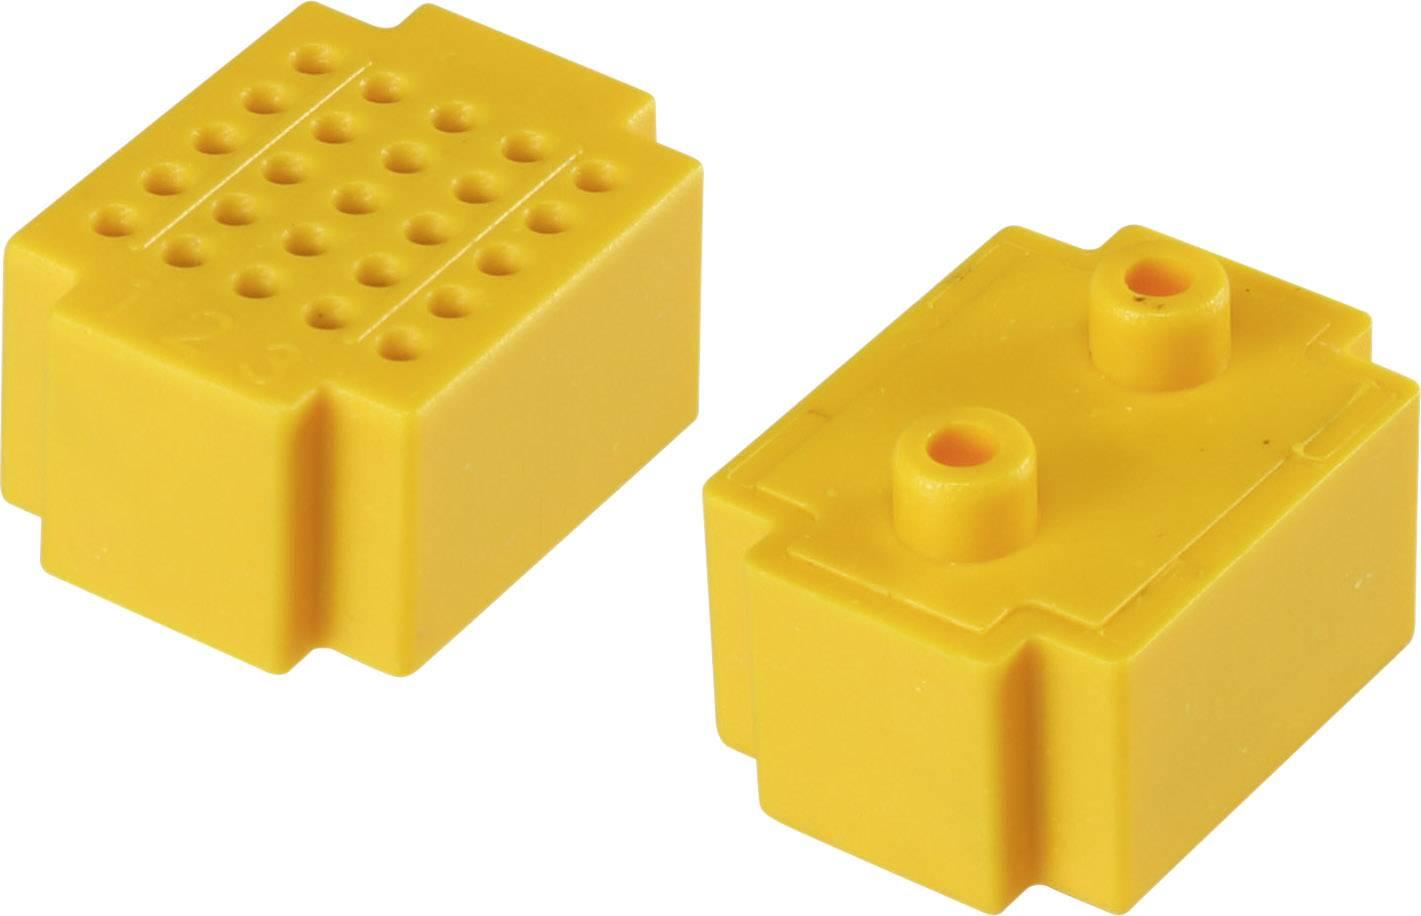 Nepájivé kontaktní pole Conrad Components žlutá, Počet pólů 25, (d x š) 20 mm x 15 mm, 1 ks